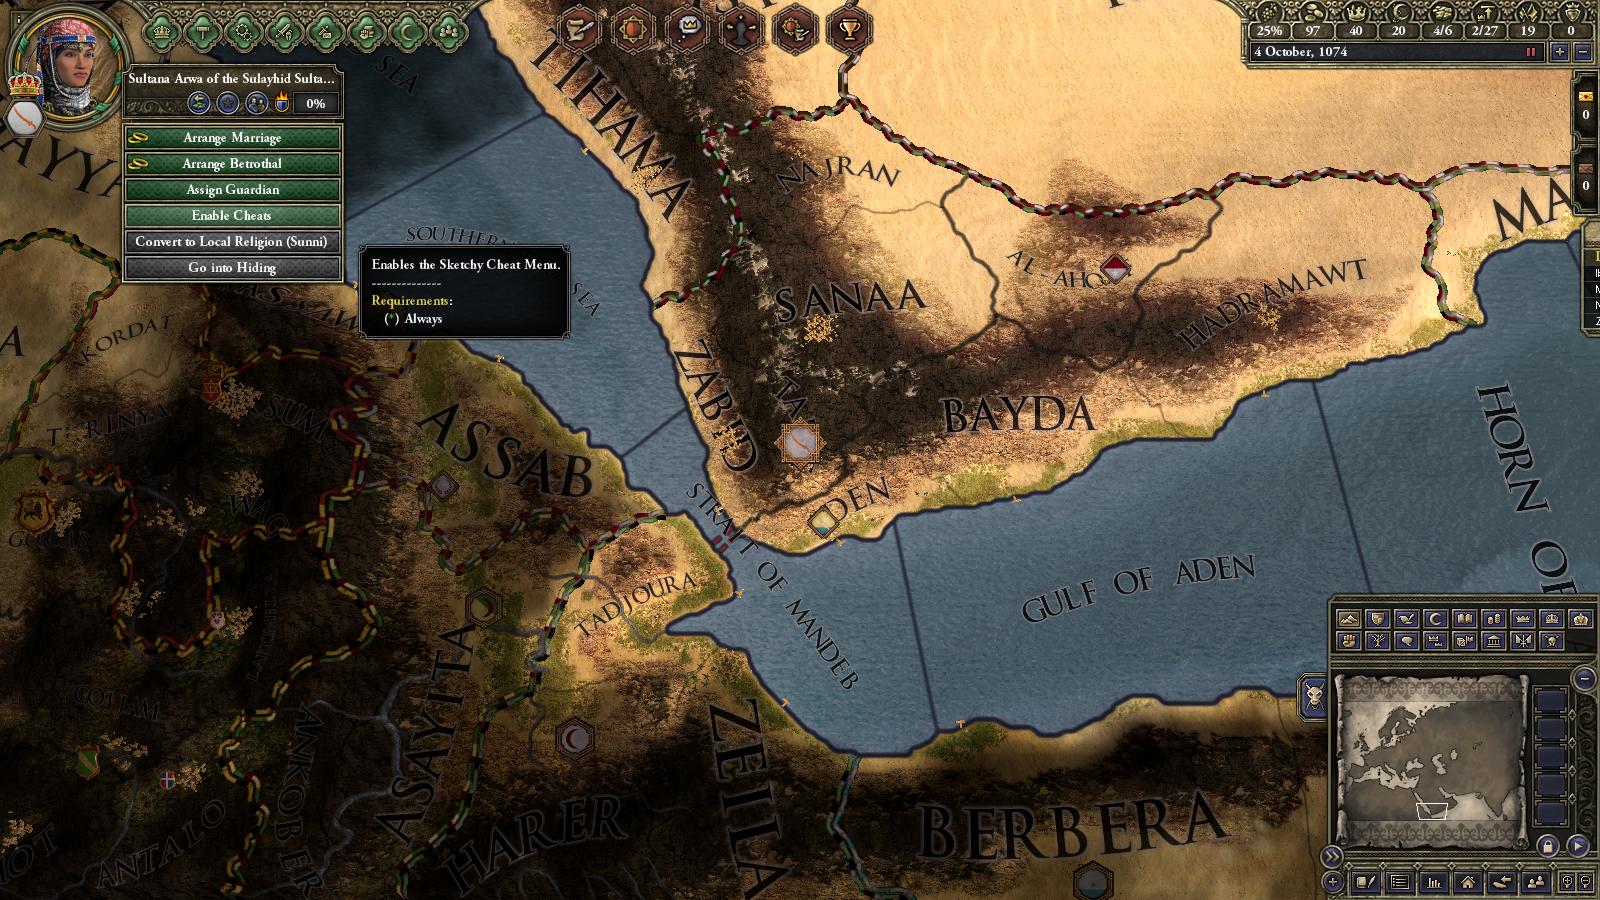 Crusader Kings 2 2.8.2.1 Patch Download